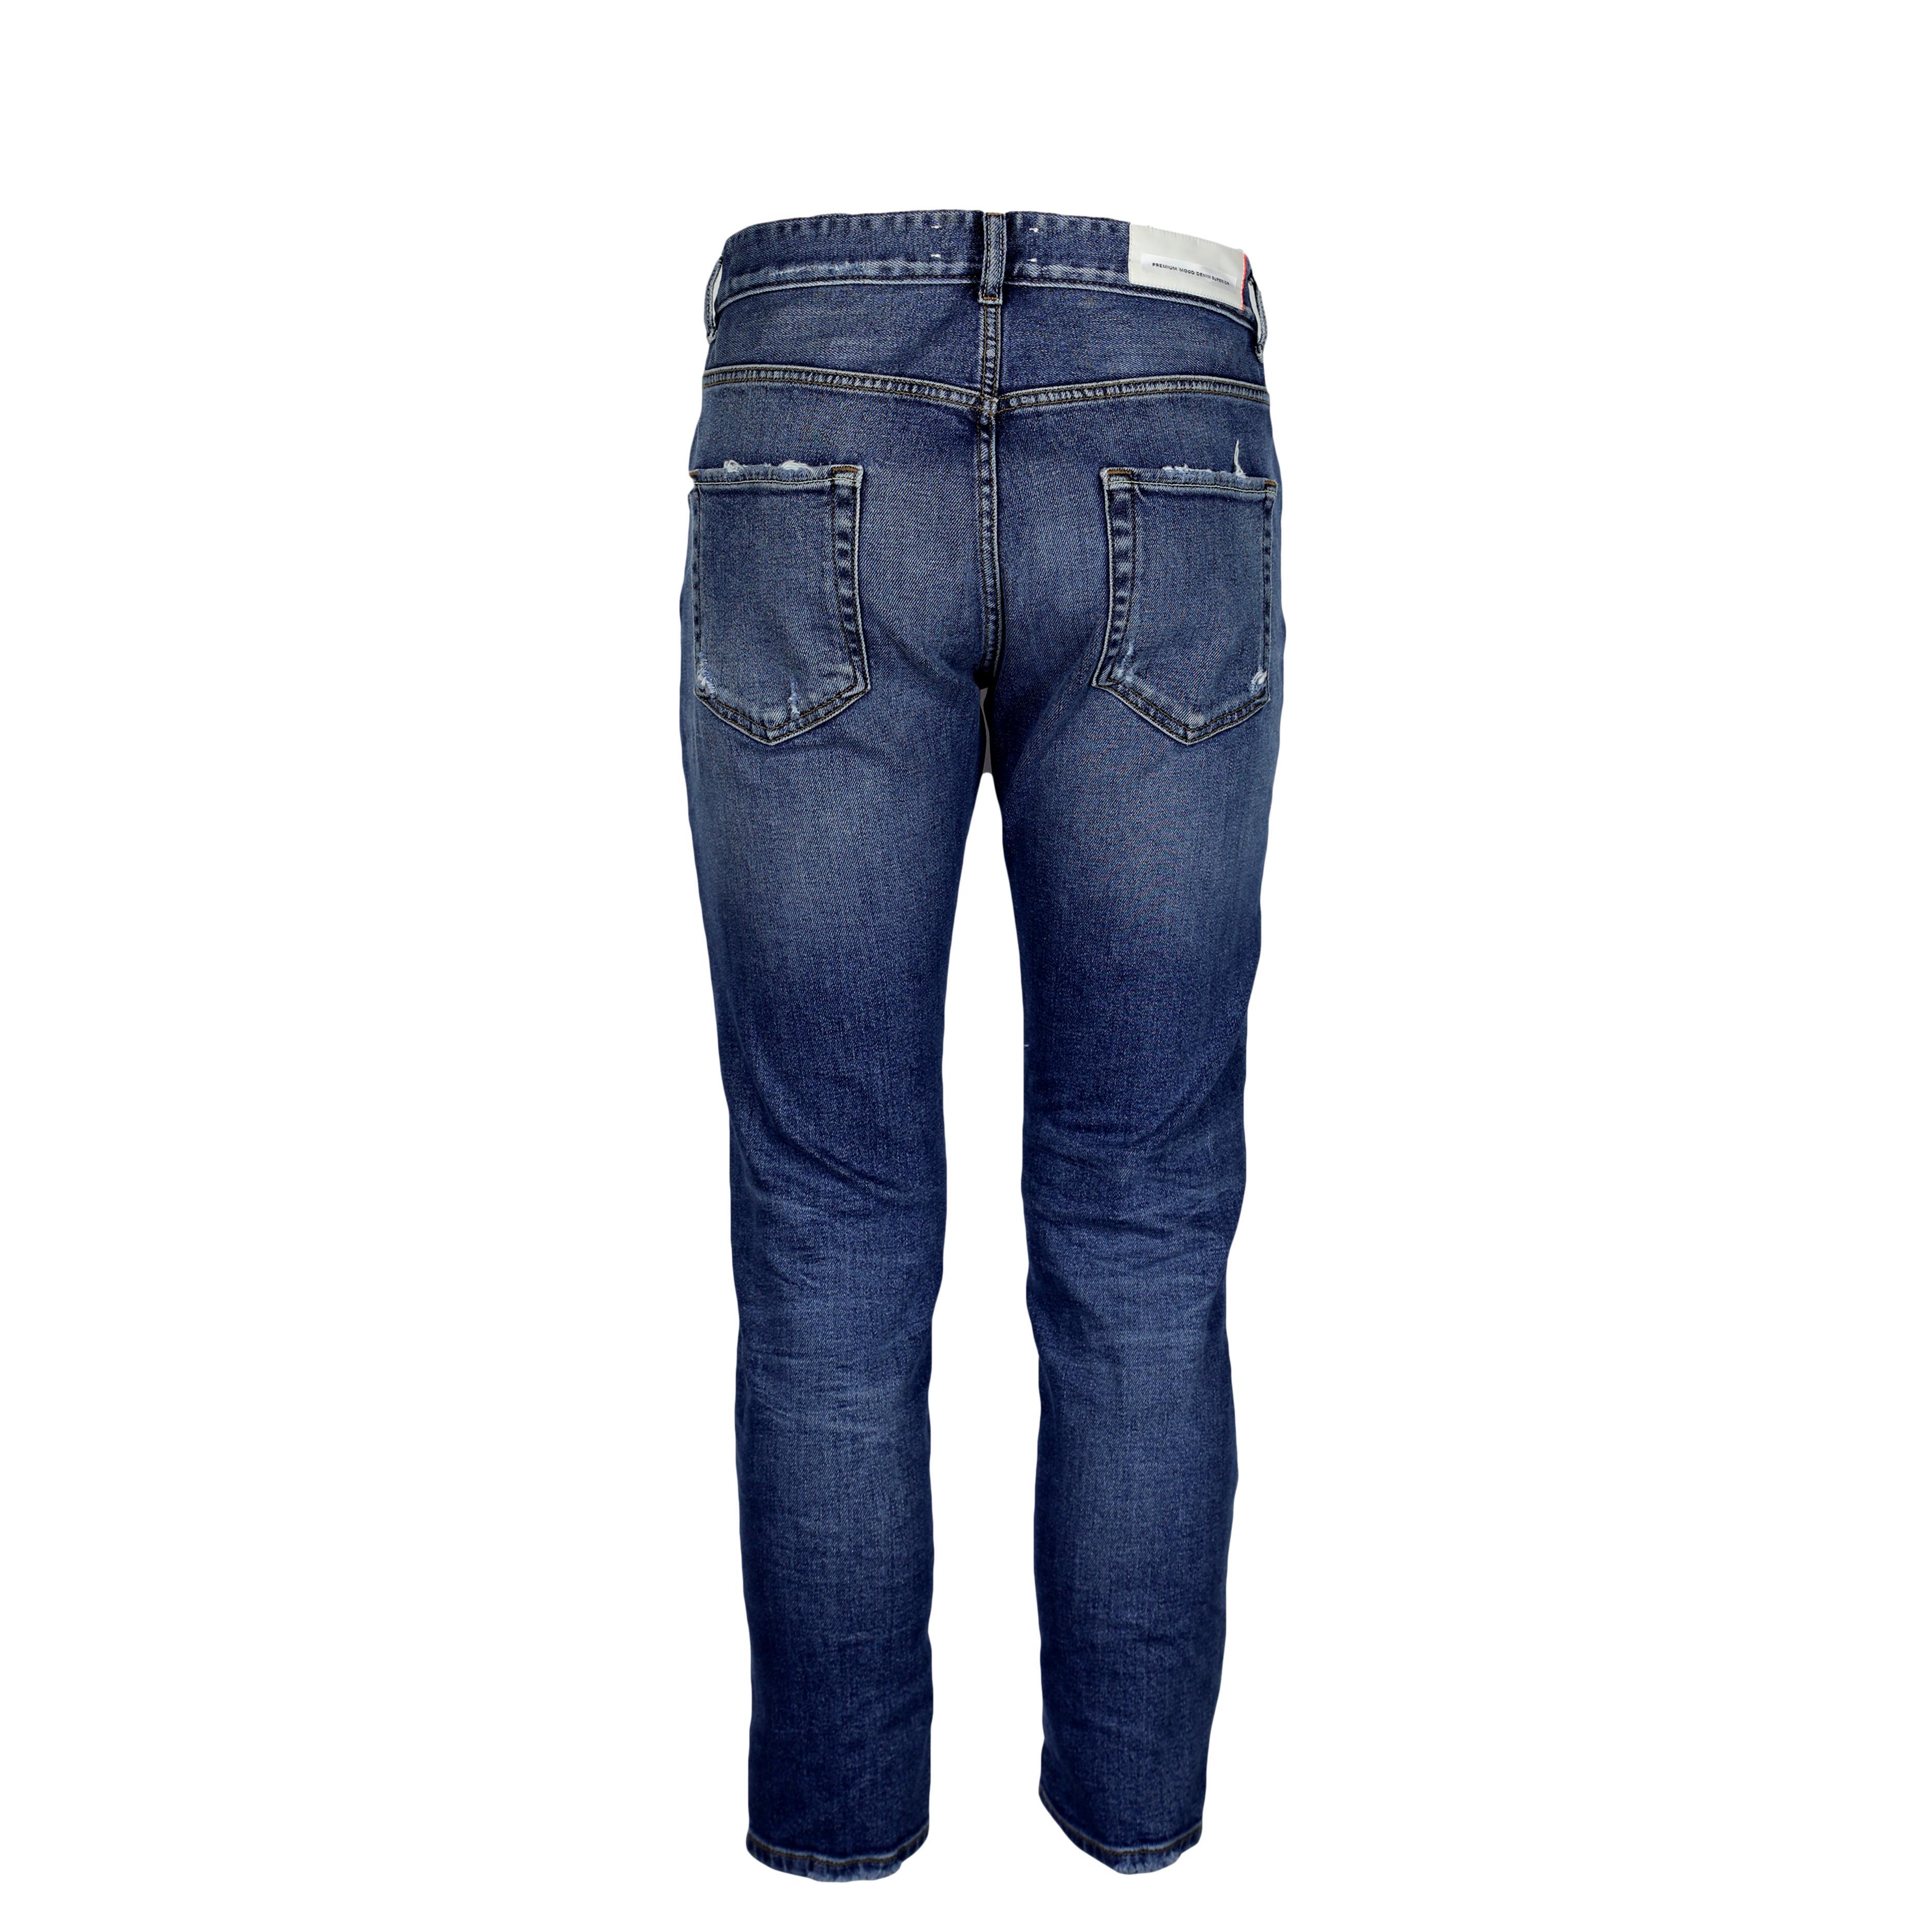 denim gerard PMDS | Jeans | S214179 624303T624